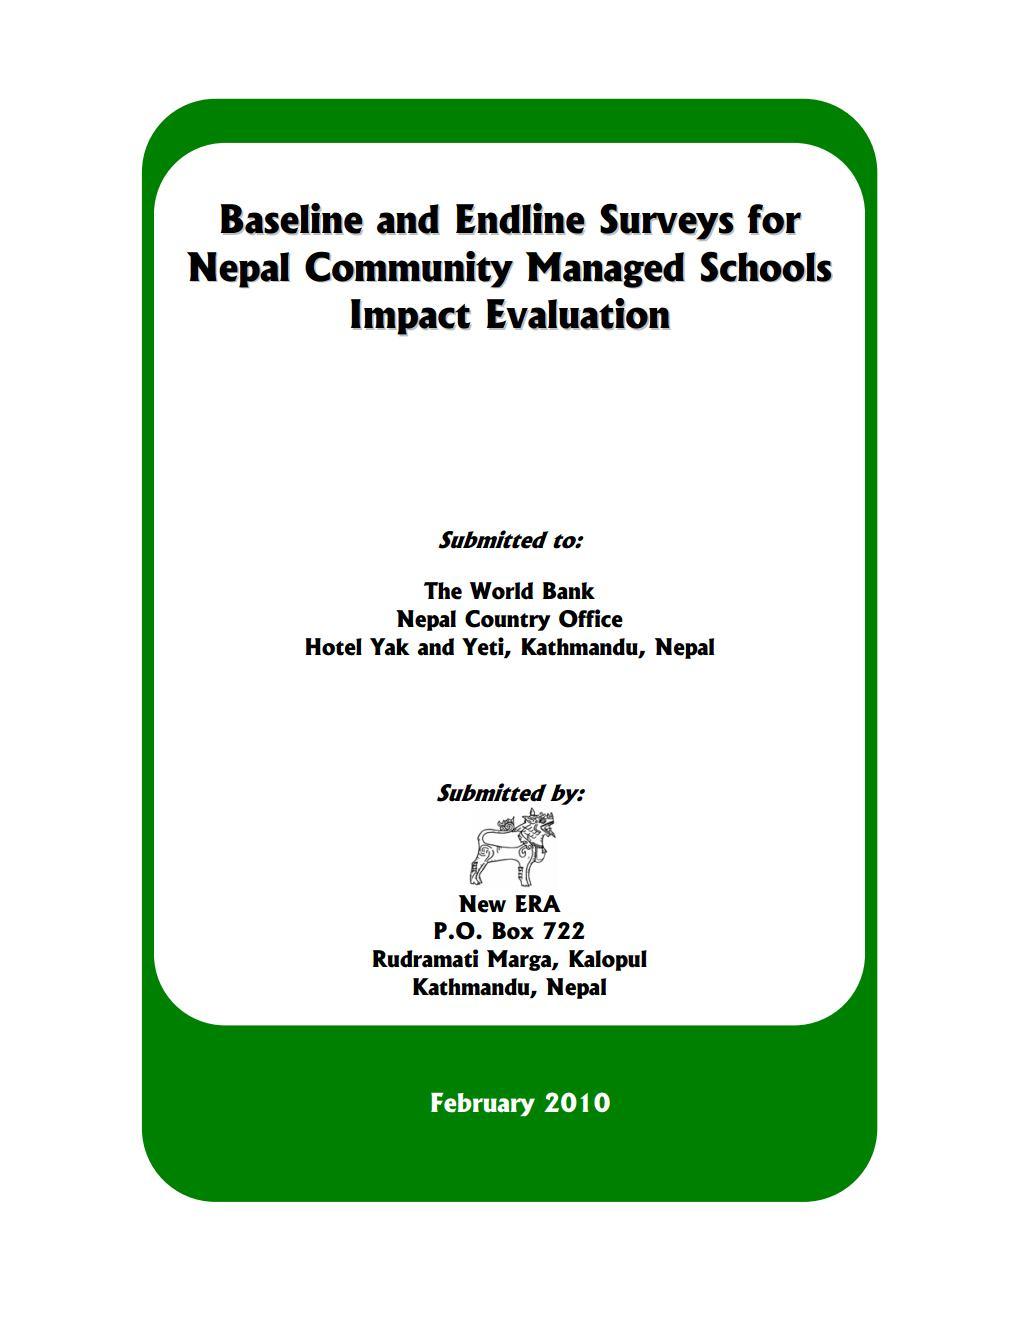 Baseline and End-line Surveys for Nepal Community Managed Schools Impact Evaluation